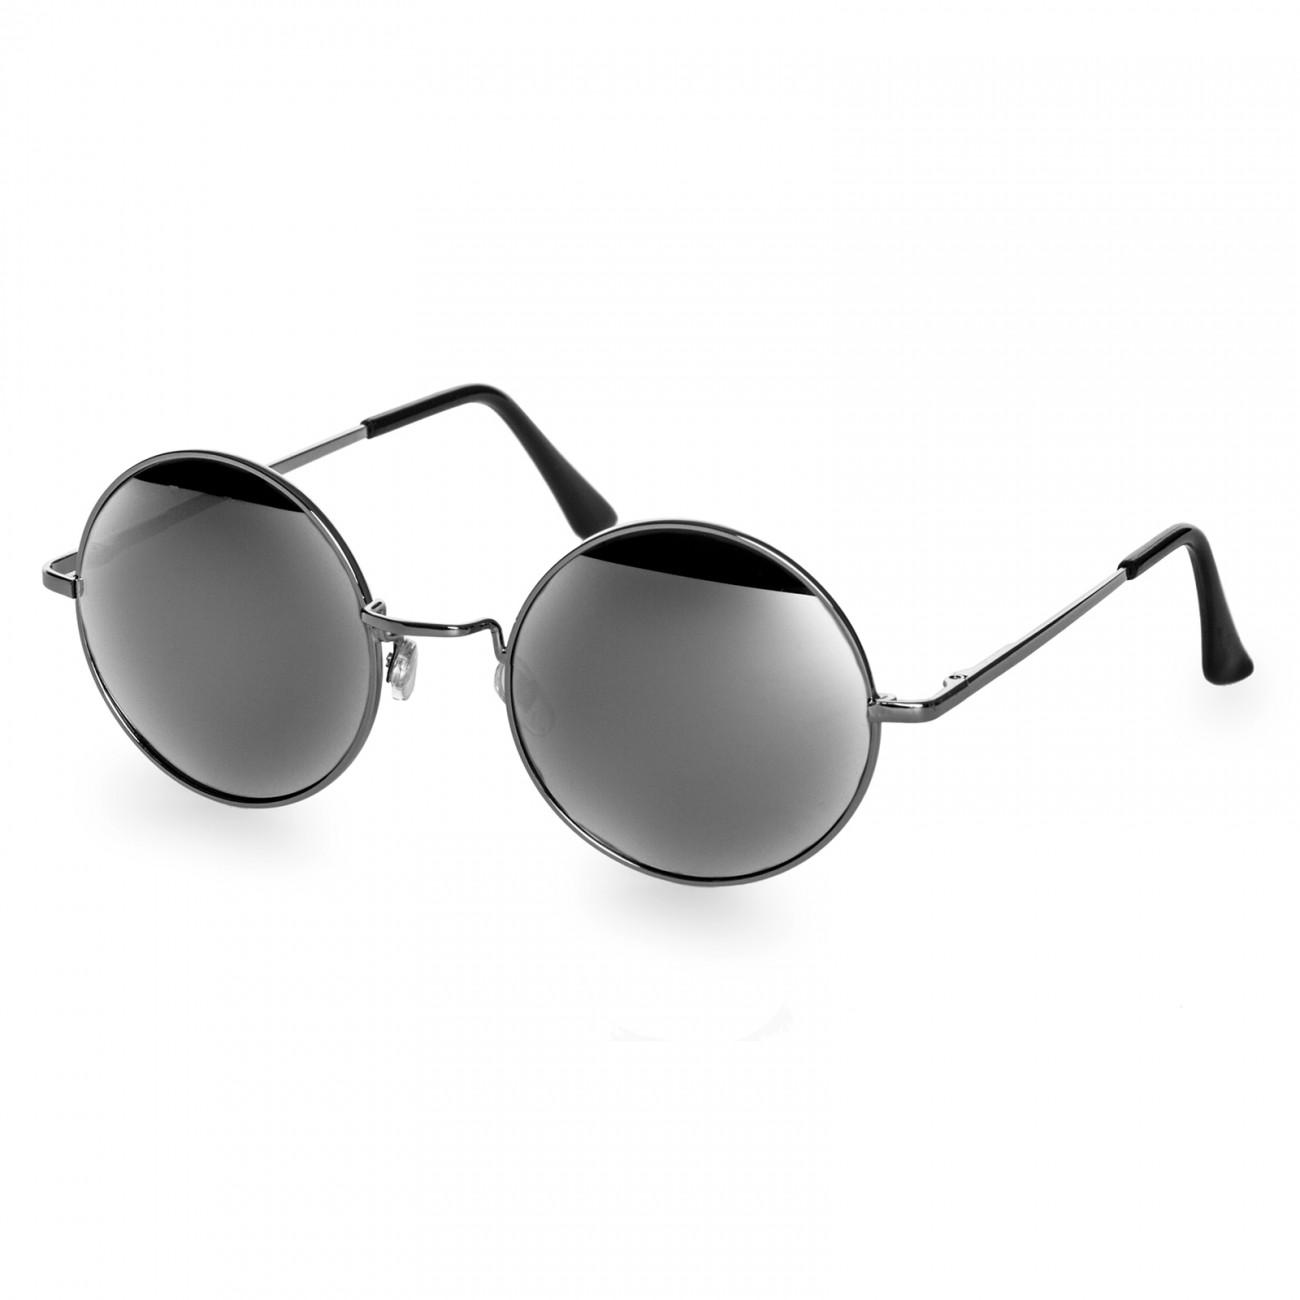 caspar sg038 gro e runde retro sonnenbrille rundbrille hippi brille nickelbrille. Black Bedroom Furniture Sets. Home Design Ideas